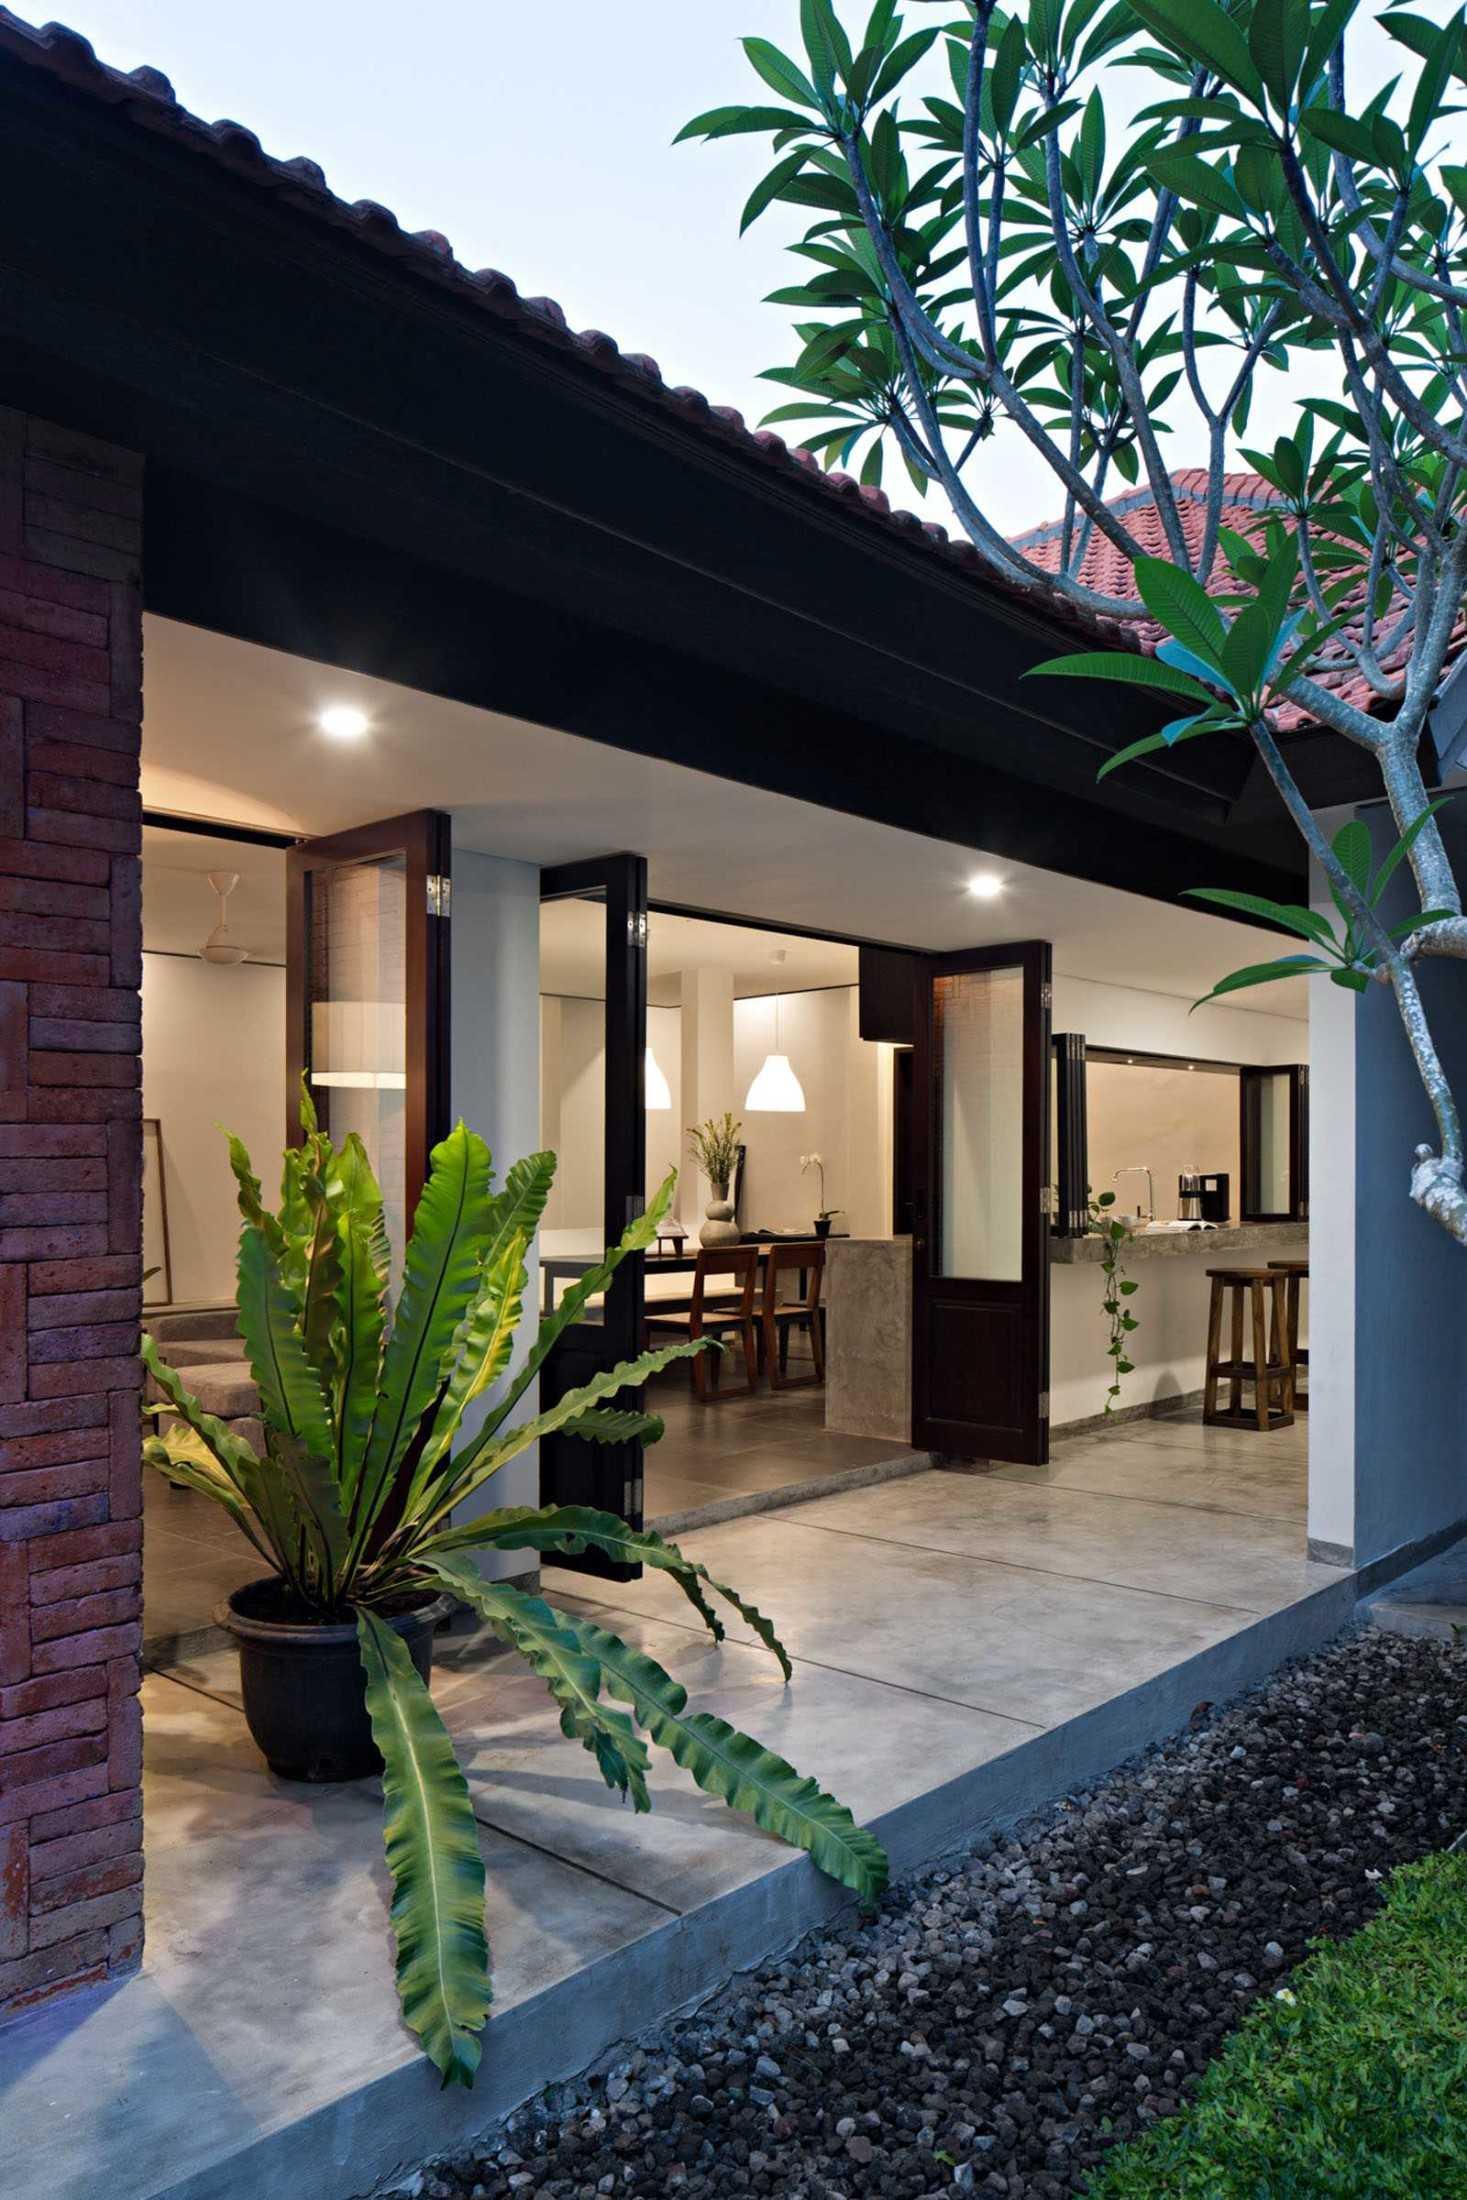 Somia Design Mandanila House Jl. Ciungwanara Ii, Renon, Denpasar Sel., Kota Denpasar, Bali, Indonesia Jl. Ciungwanara Ii, Renon, Denpasar Sel., Kota Denpasar, Bali, Indonesia Somia-Design-Mandanila-House  60212